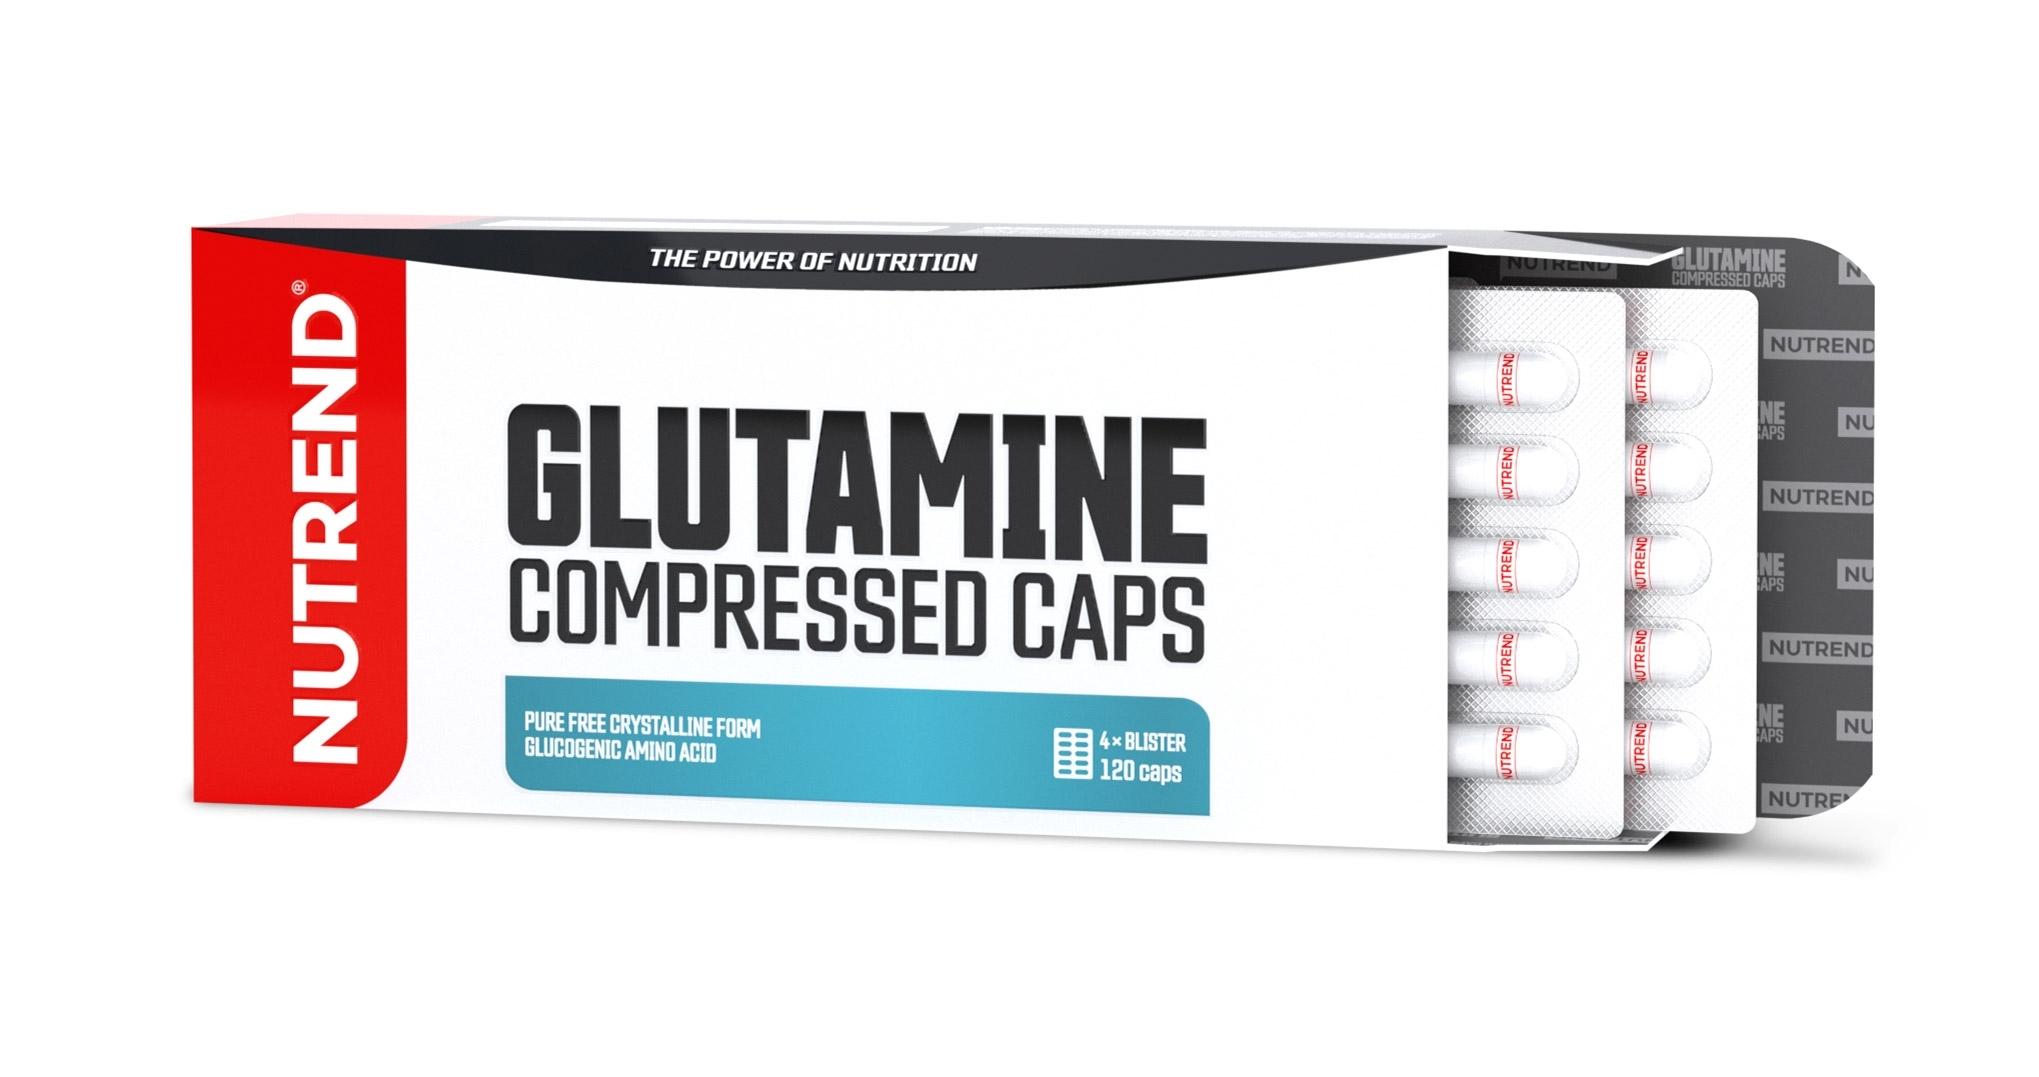 GLUTAMINE COMPRESSED CAPS, obsahuje 120 kapslí